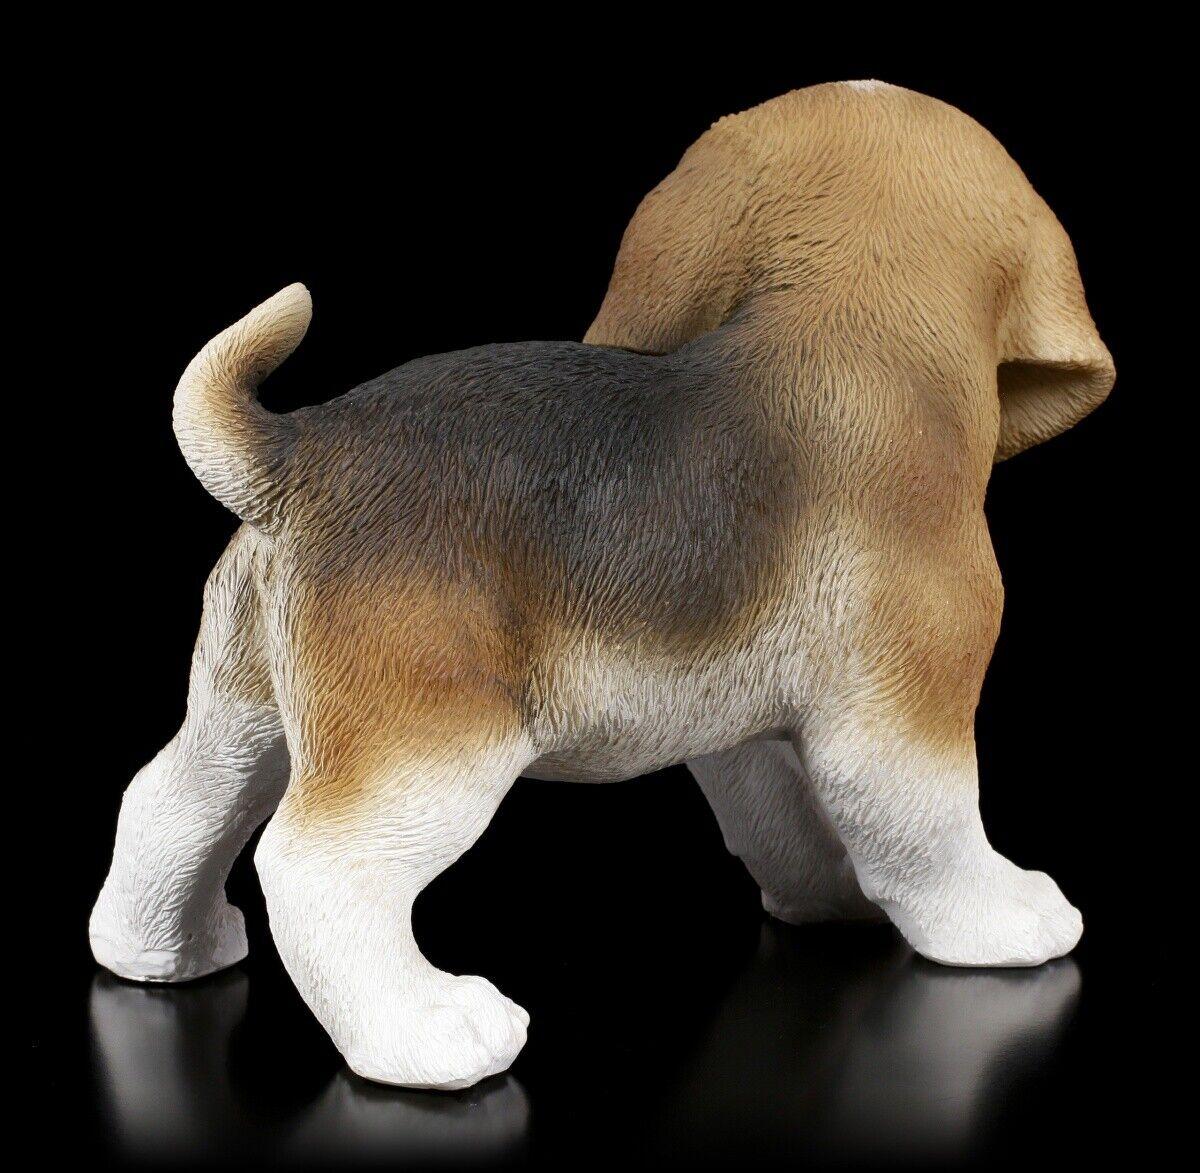 Esschert Garten Figur Chihuahua Welpe Puppy  2 Modelle Frost+UV-Fest 37000404